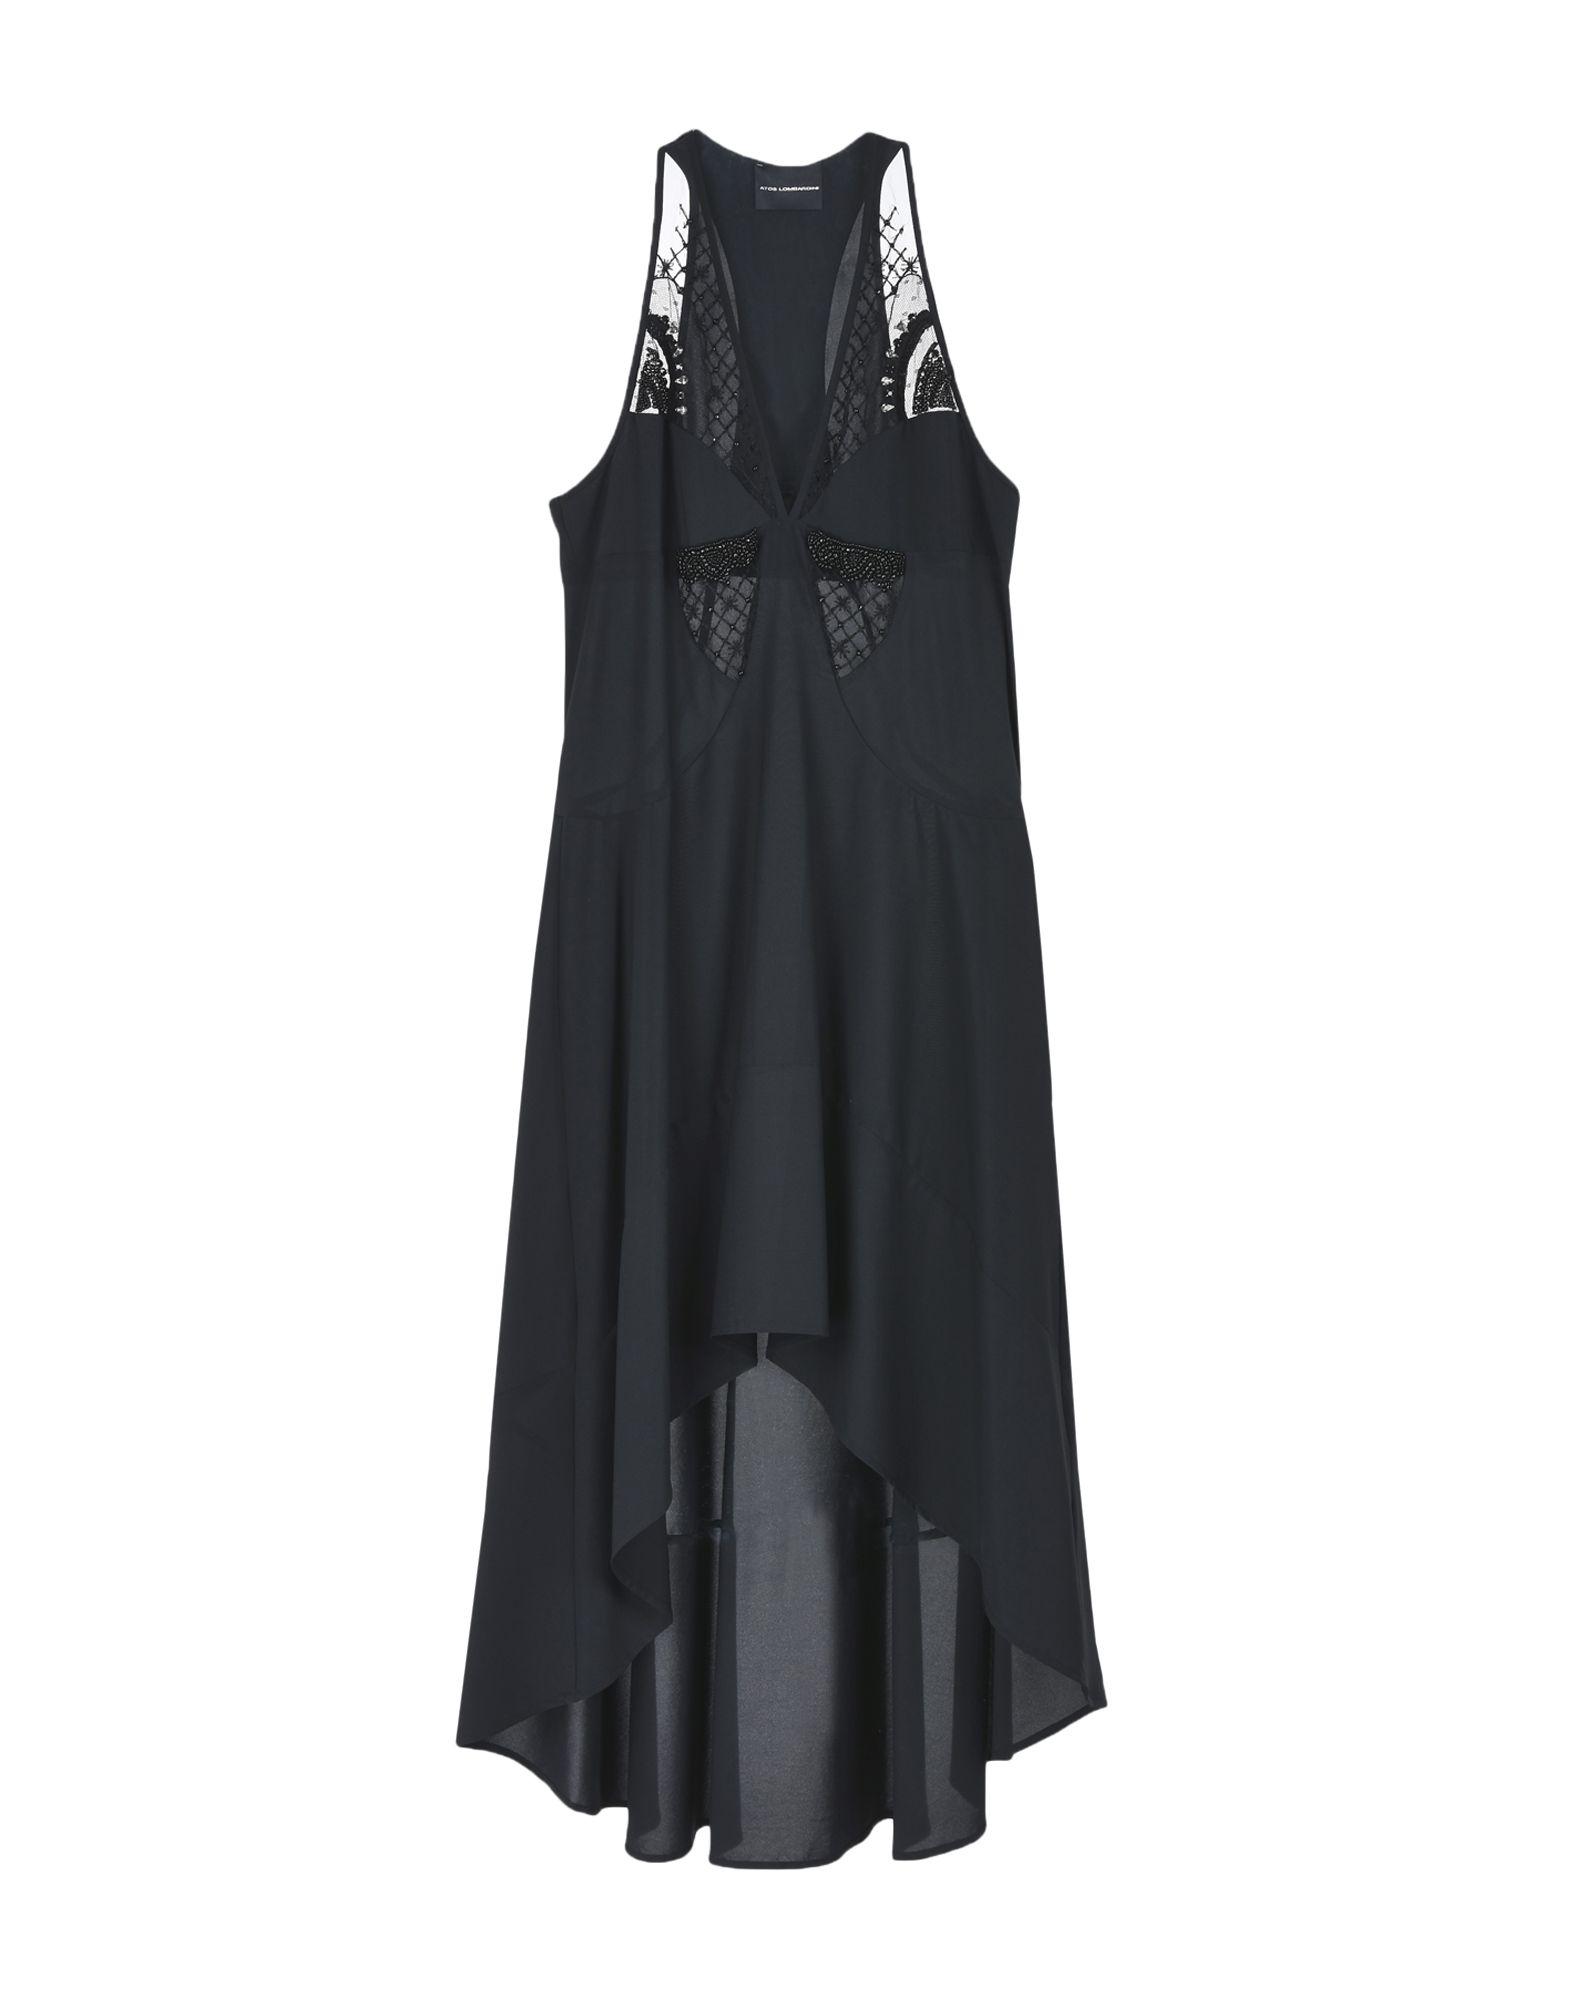 ATOS LOMBARDINI Платье длиной 3/4 lisa corti платье длиной 3 4